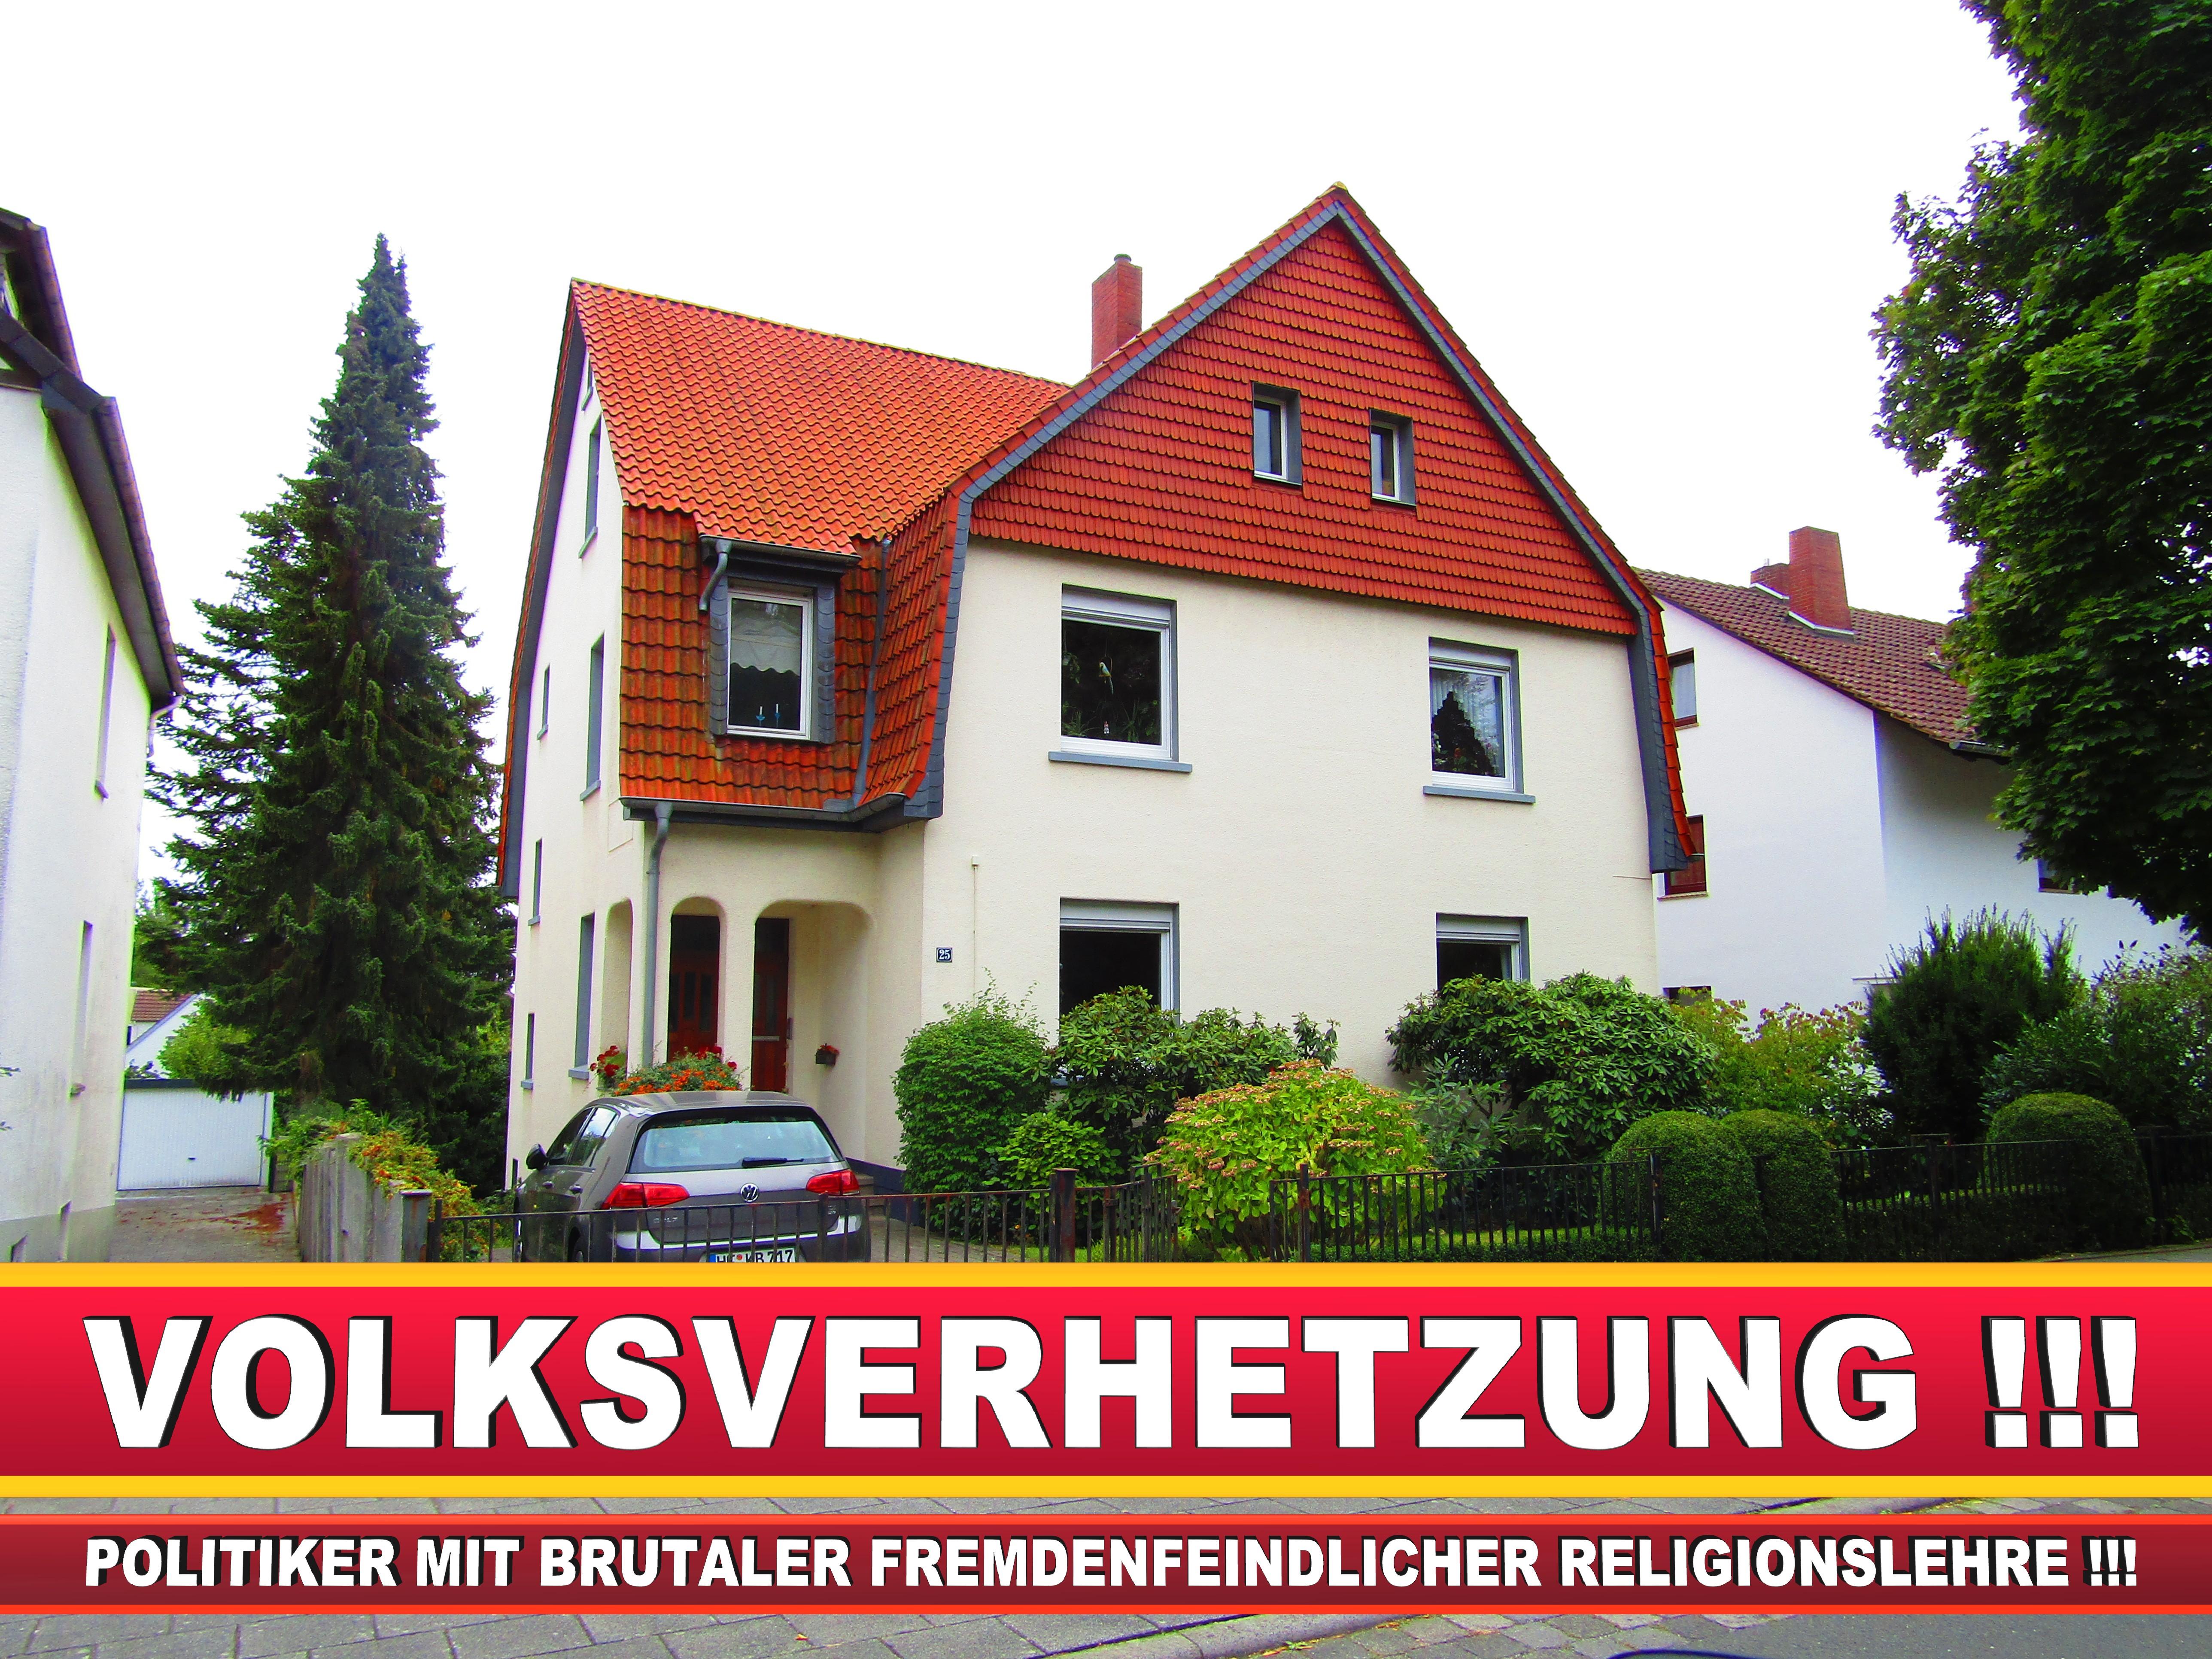 KLAUS PETERMANN LANDGERICHT BIELEFELD (4) LANDTAGSWAHL BUNDESTAGSWAHL BÜRGERMEISTERWAHL